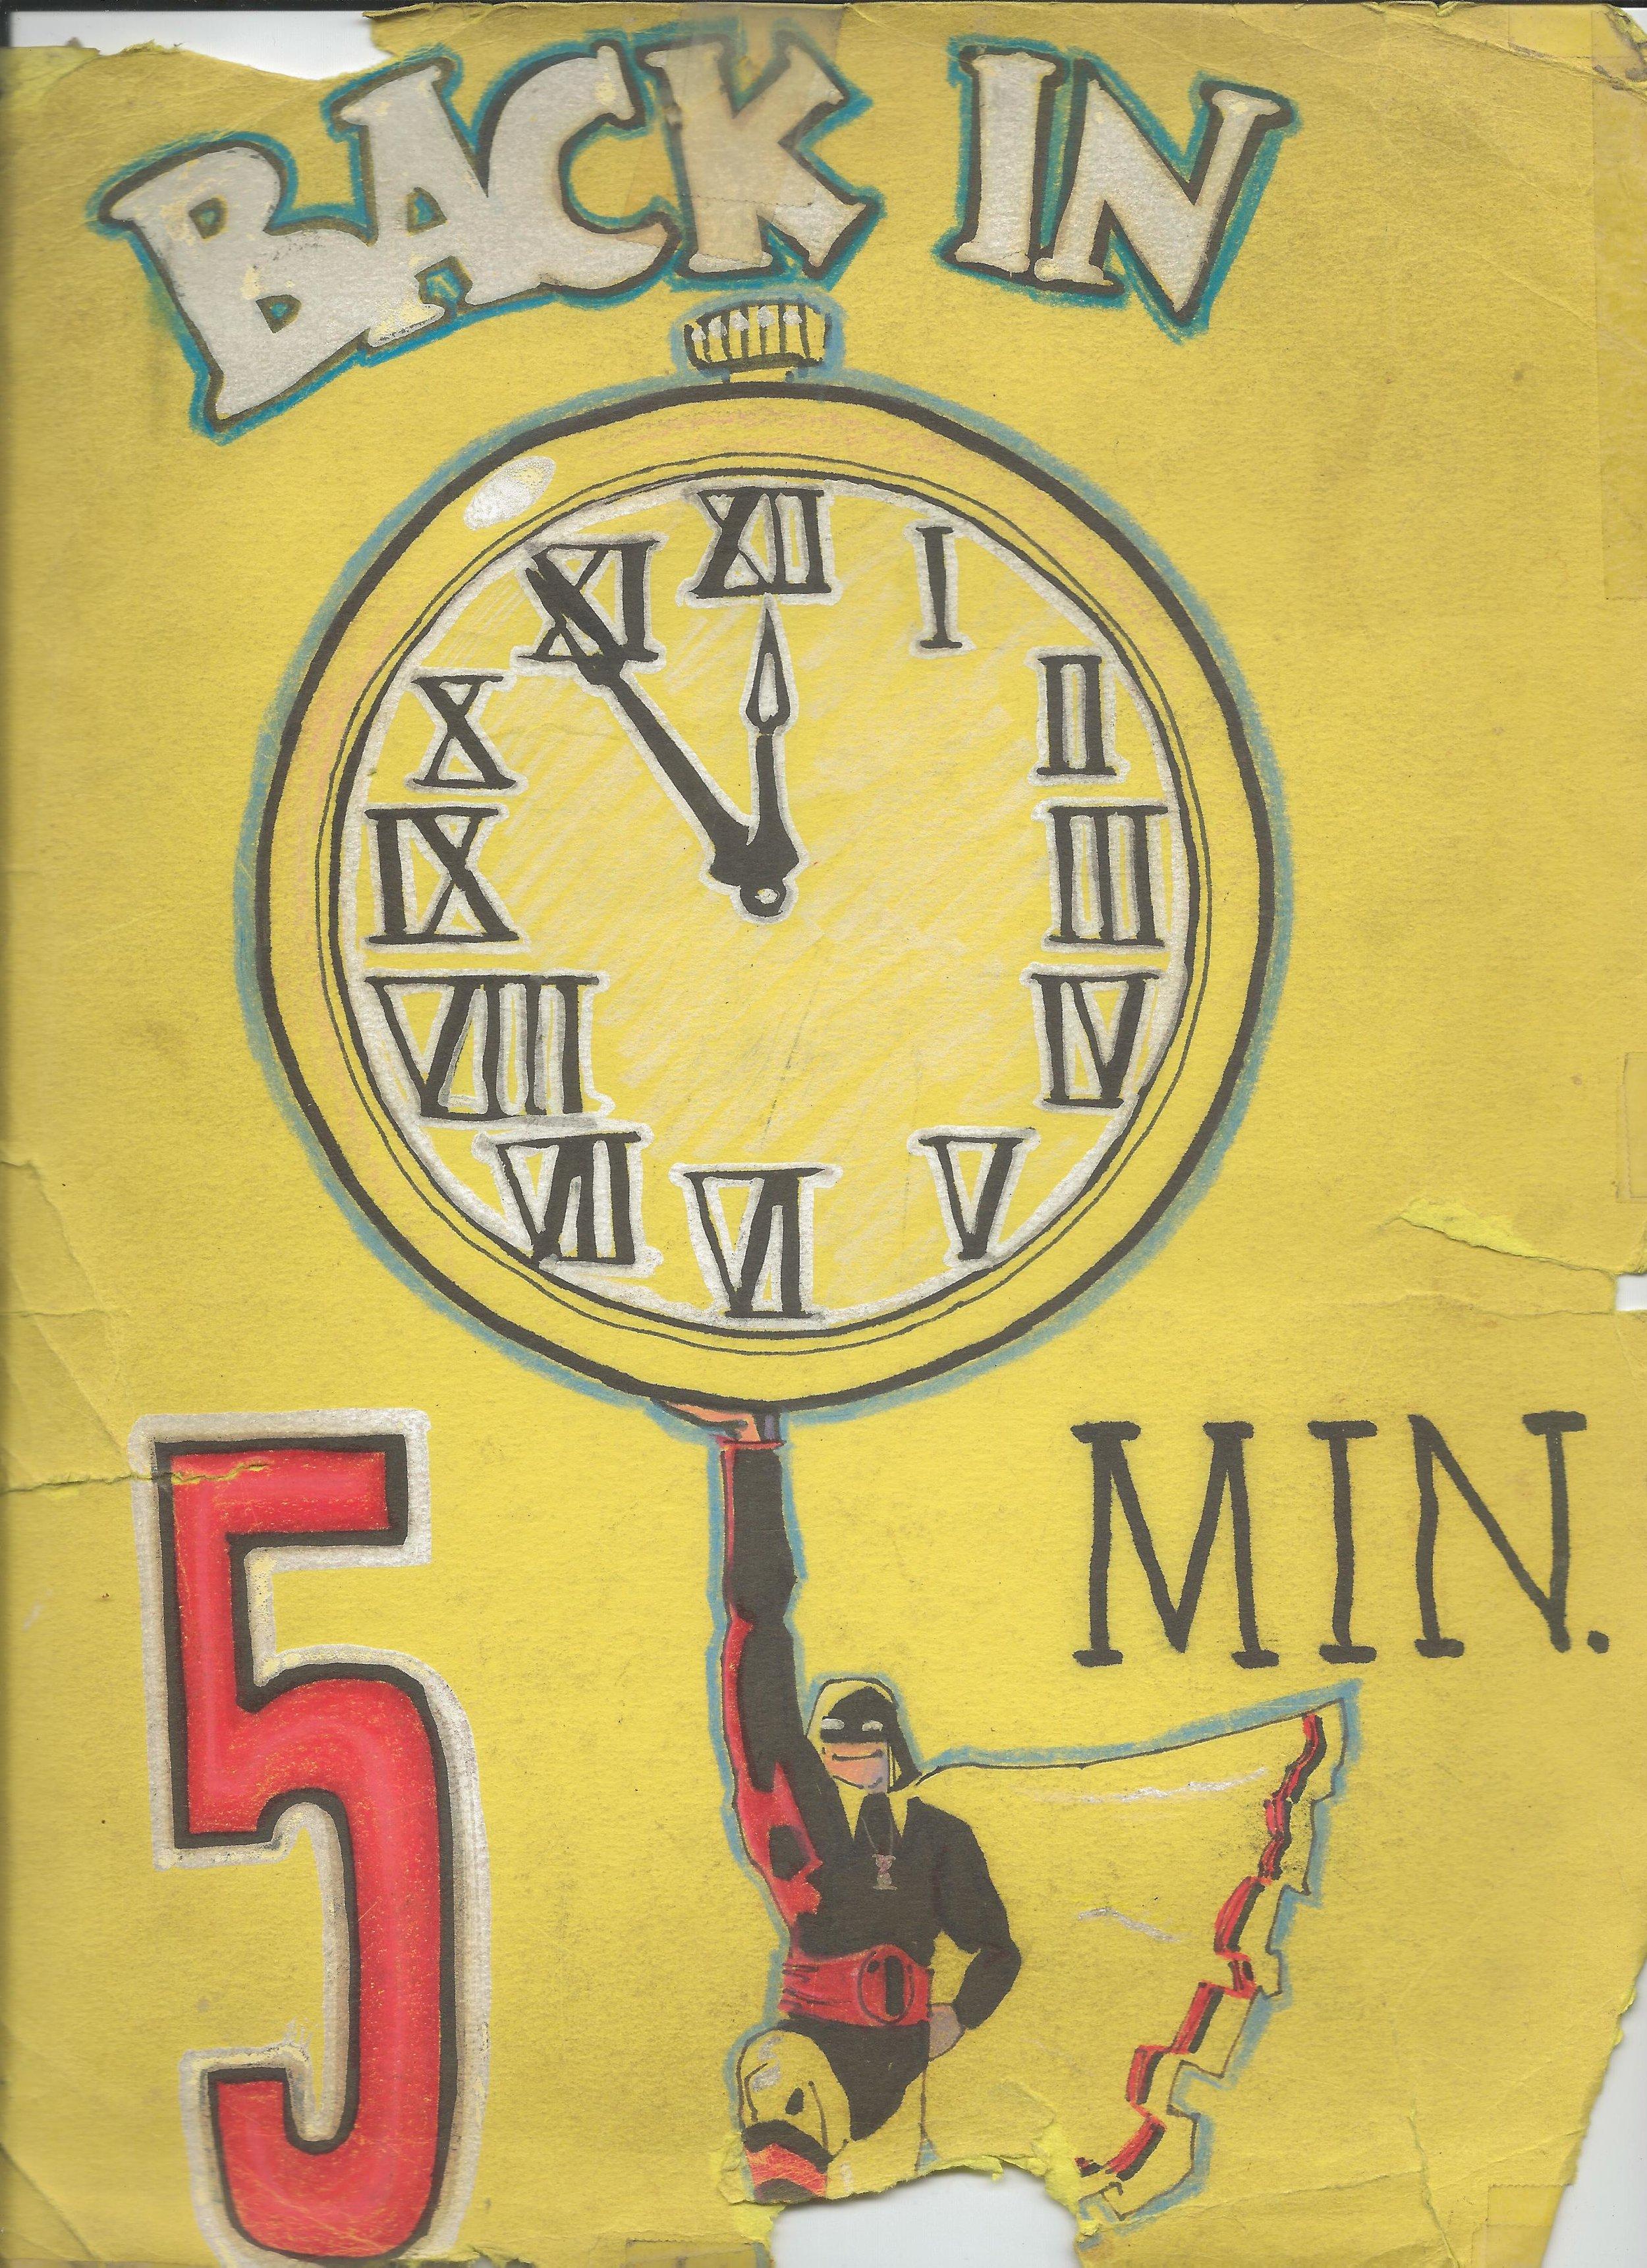 1990s Back in Five Minutes Sign - Matt Wagner.jpg